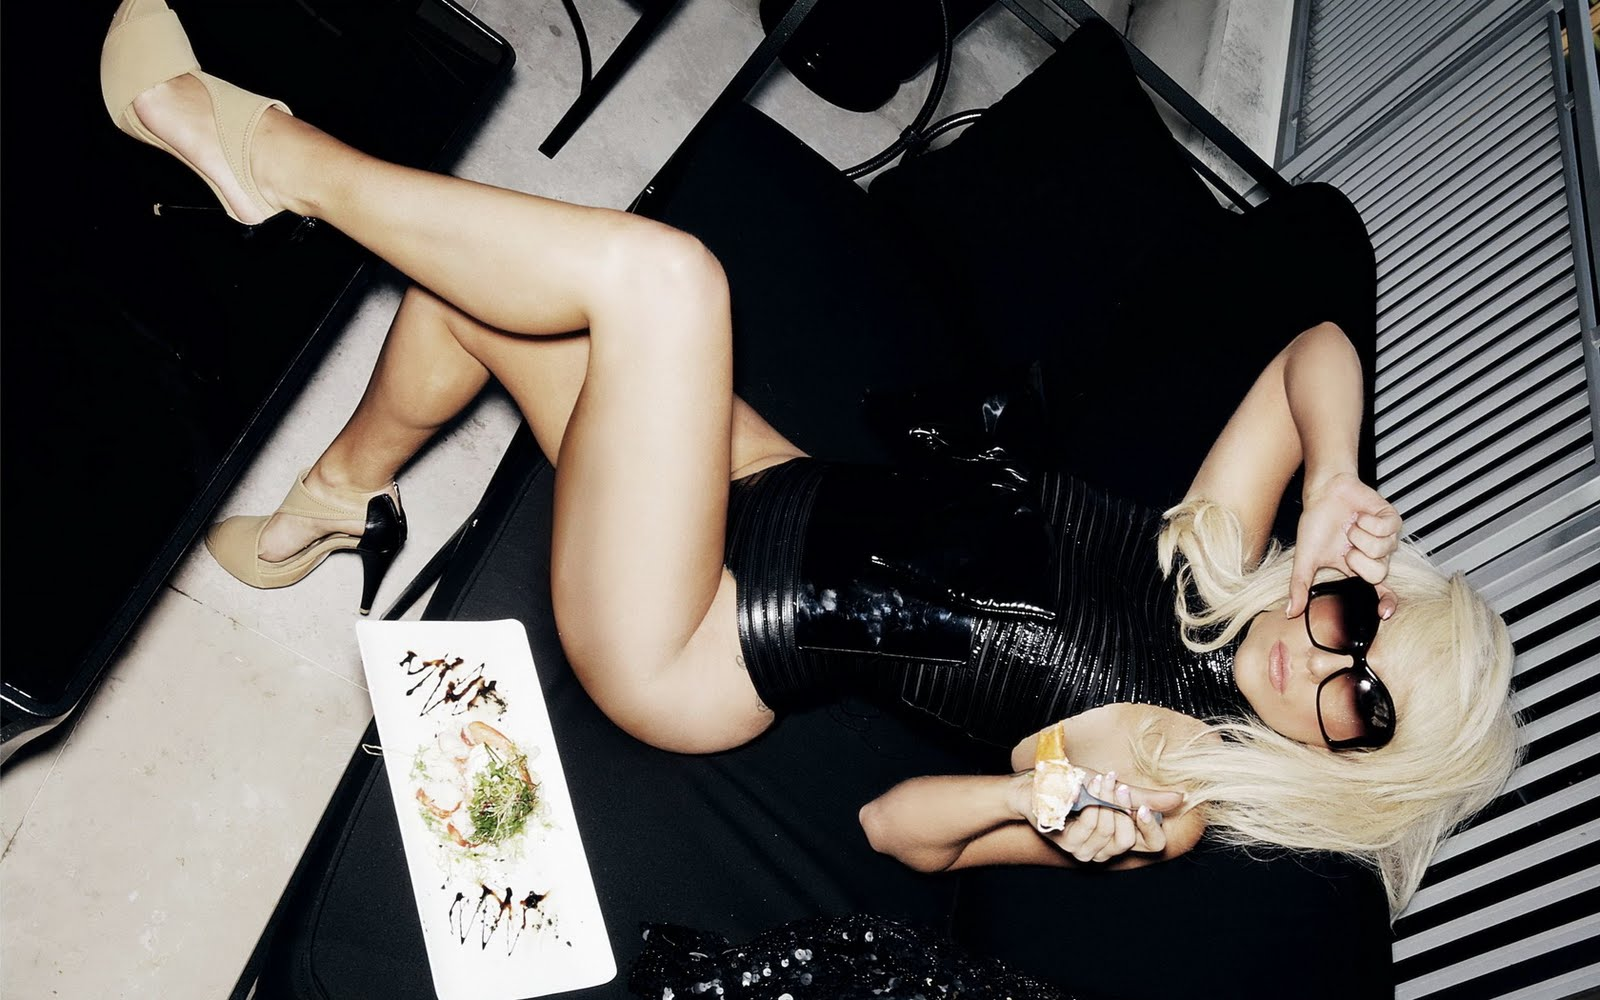 http://4.bp.blogspot.com/_N9_mRzq5wZc/TG5epagWPAI/AAAAAAAAAJ4/mVUDeIrBTdI/s1600/lady-gaga-hot-legs.jpg